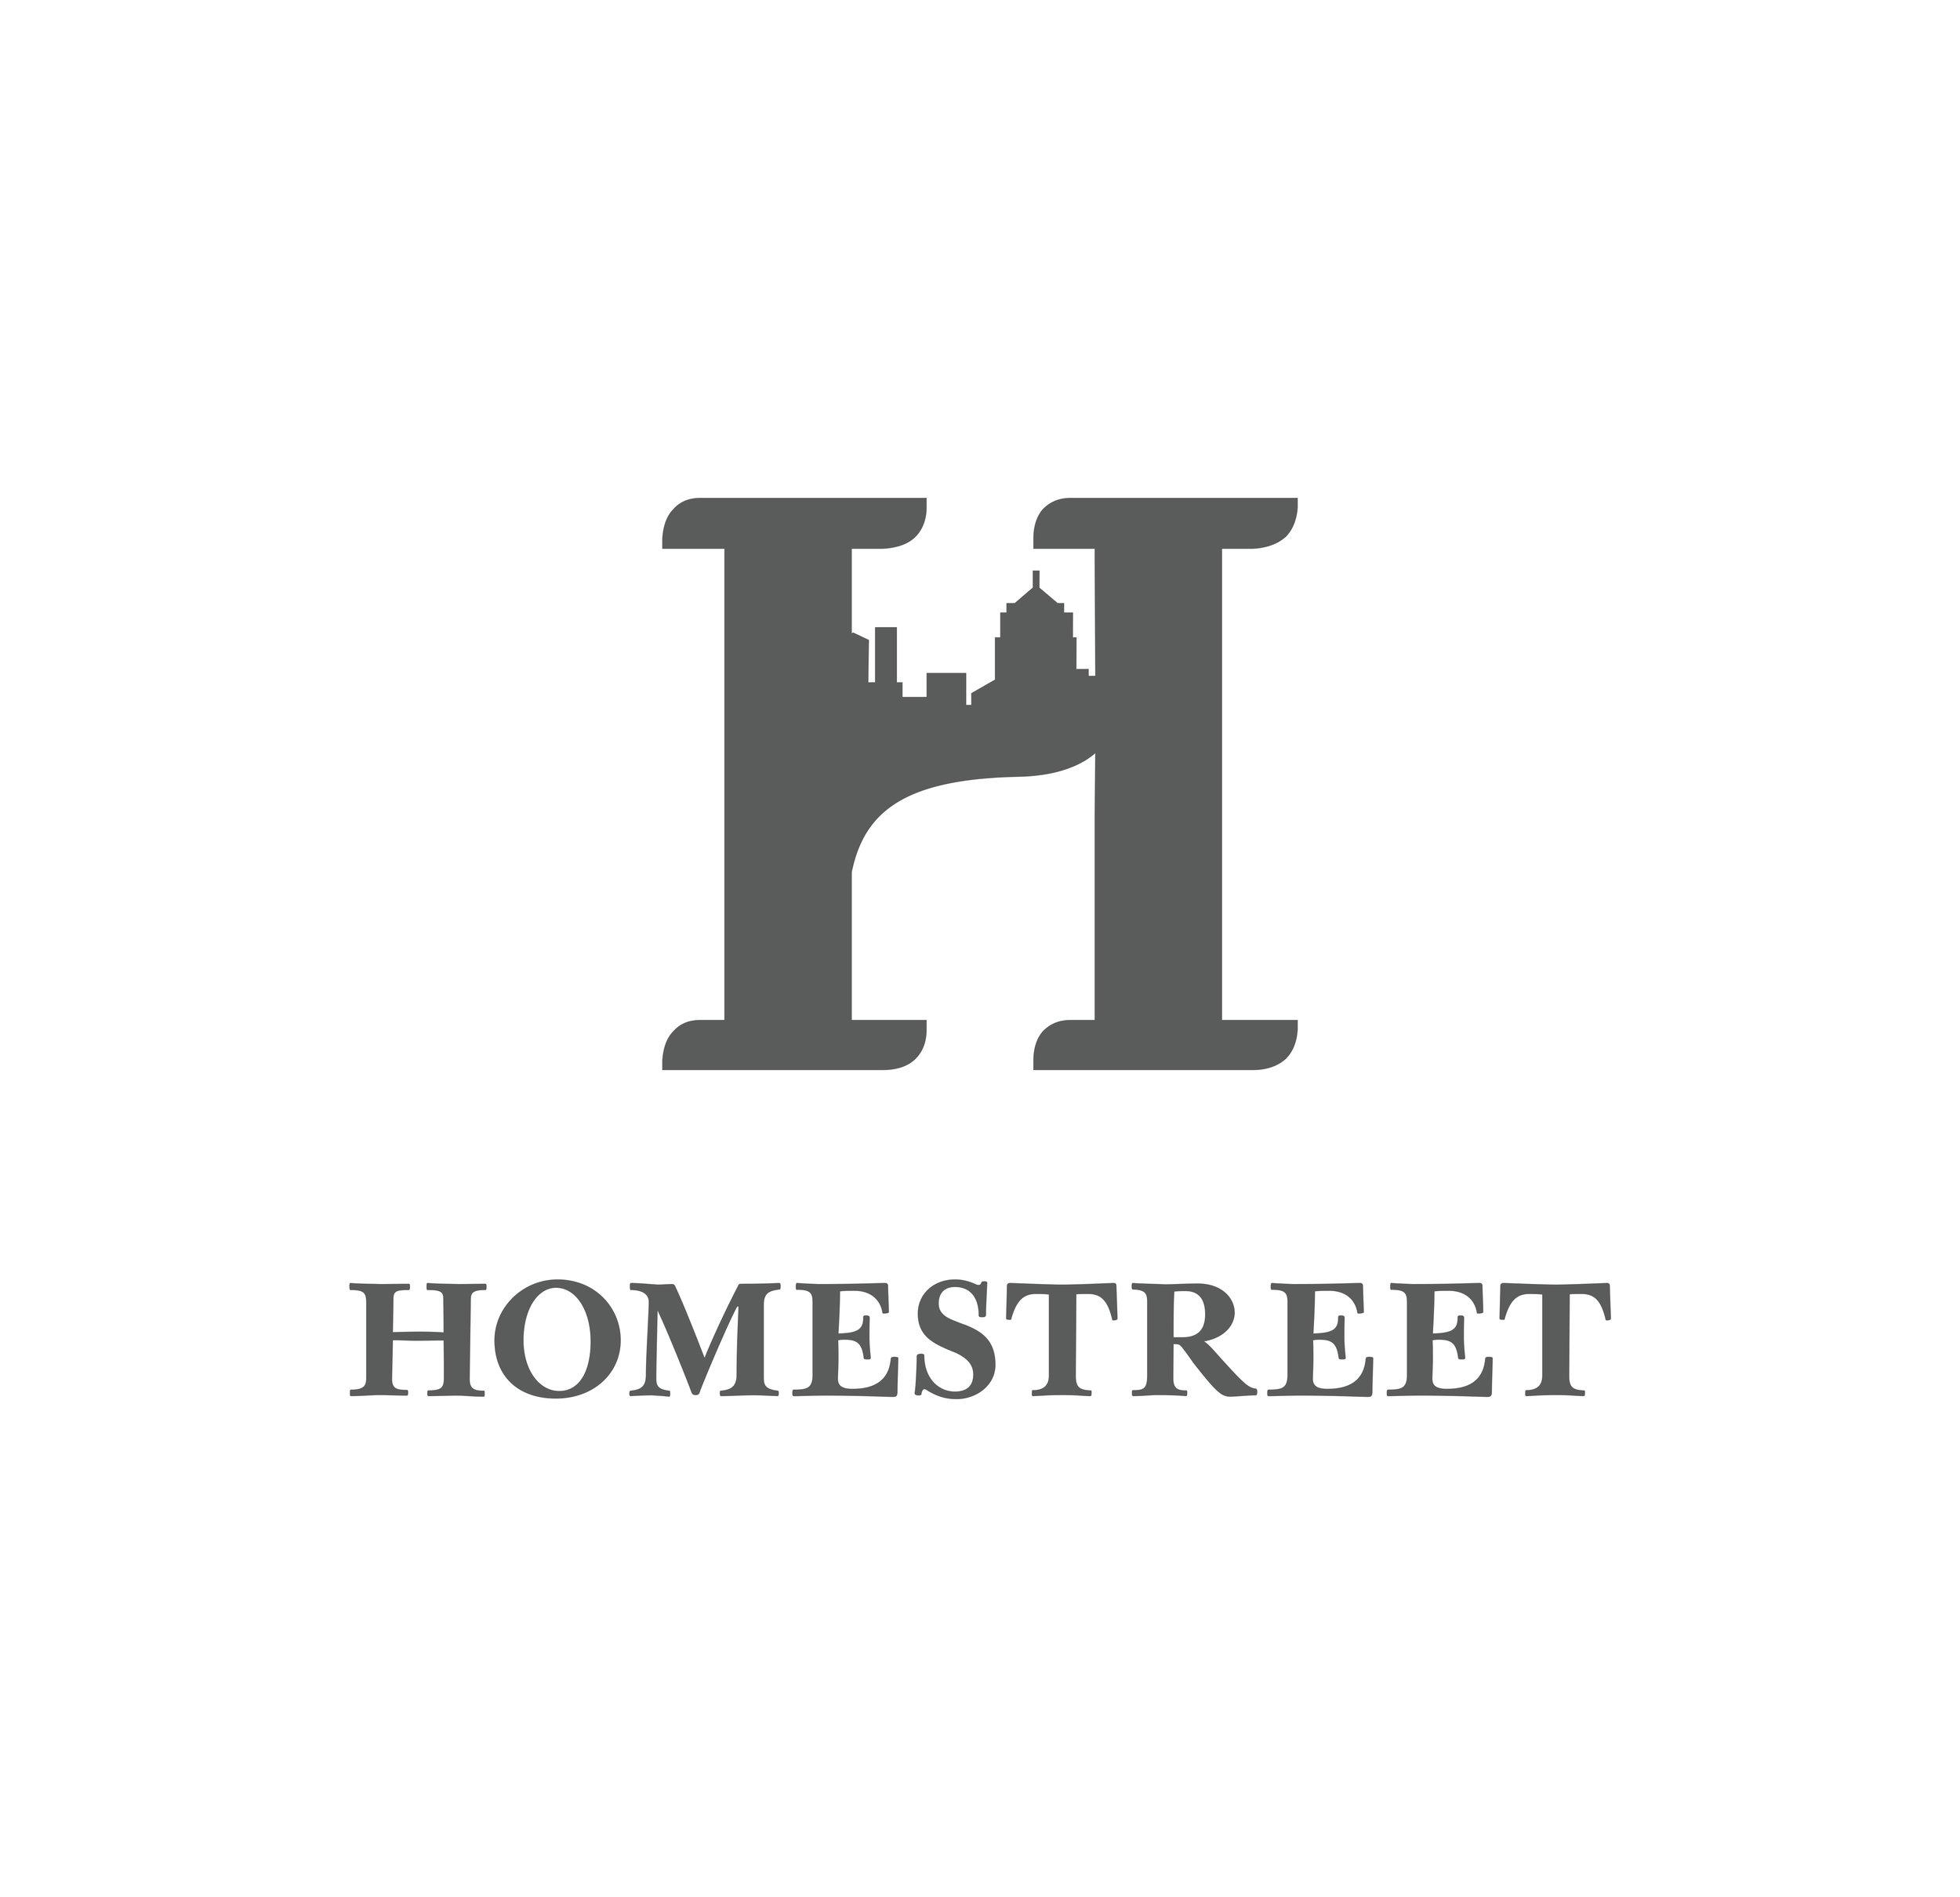 HOMESTREET_8.jpg